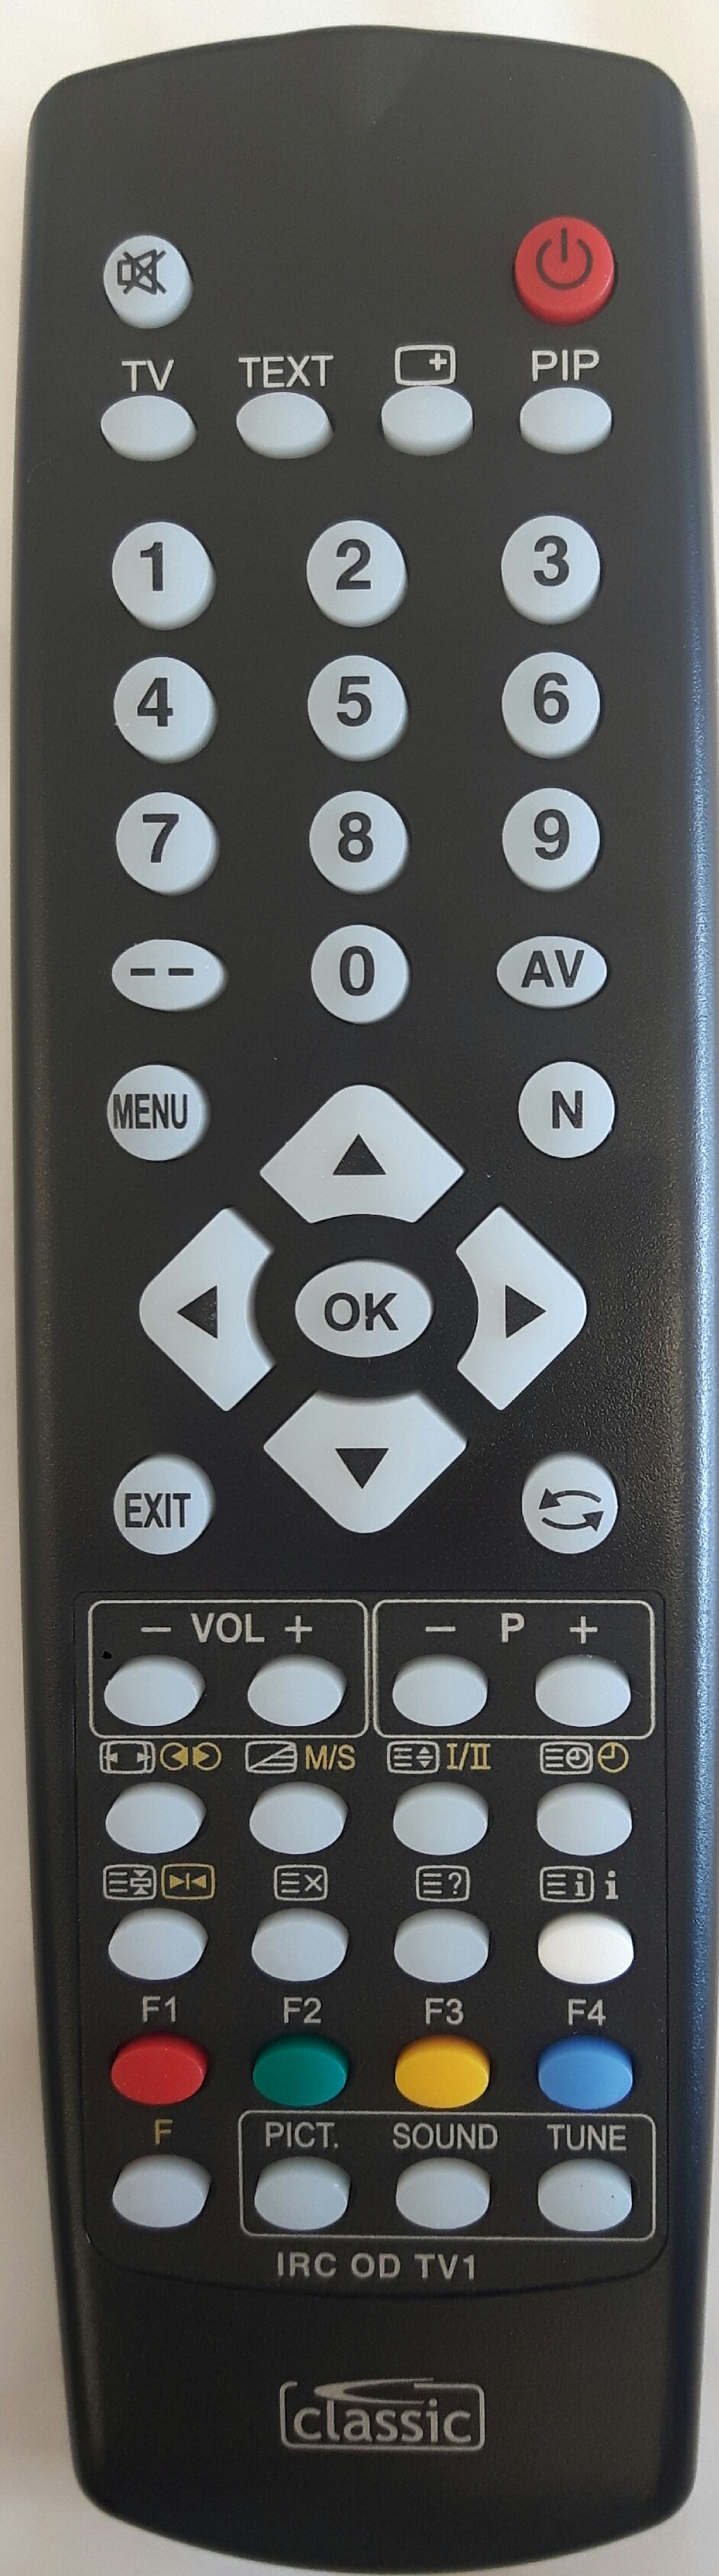 Bang & Olufsen BEOVISION 9002 Remote Control